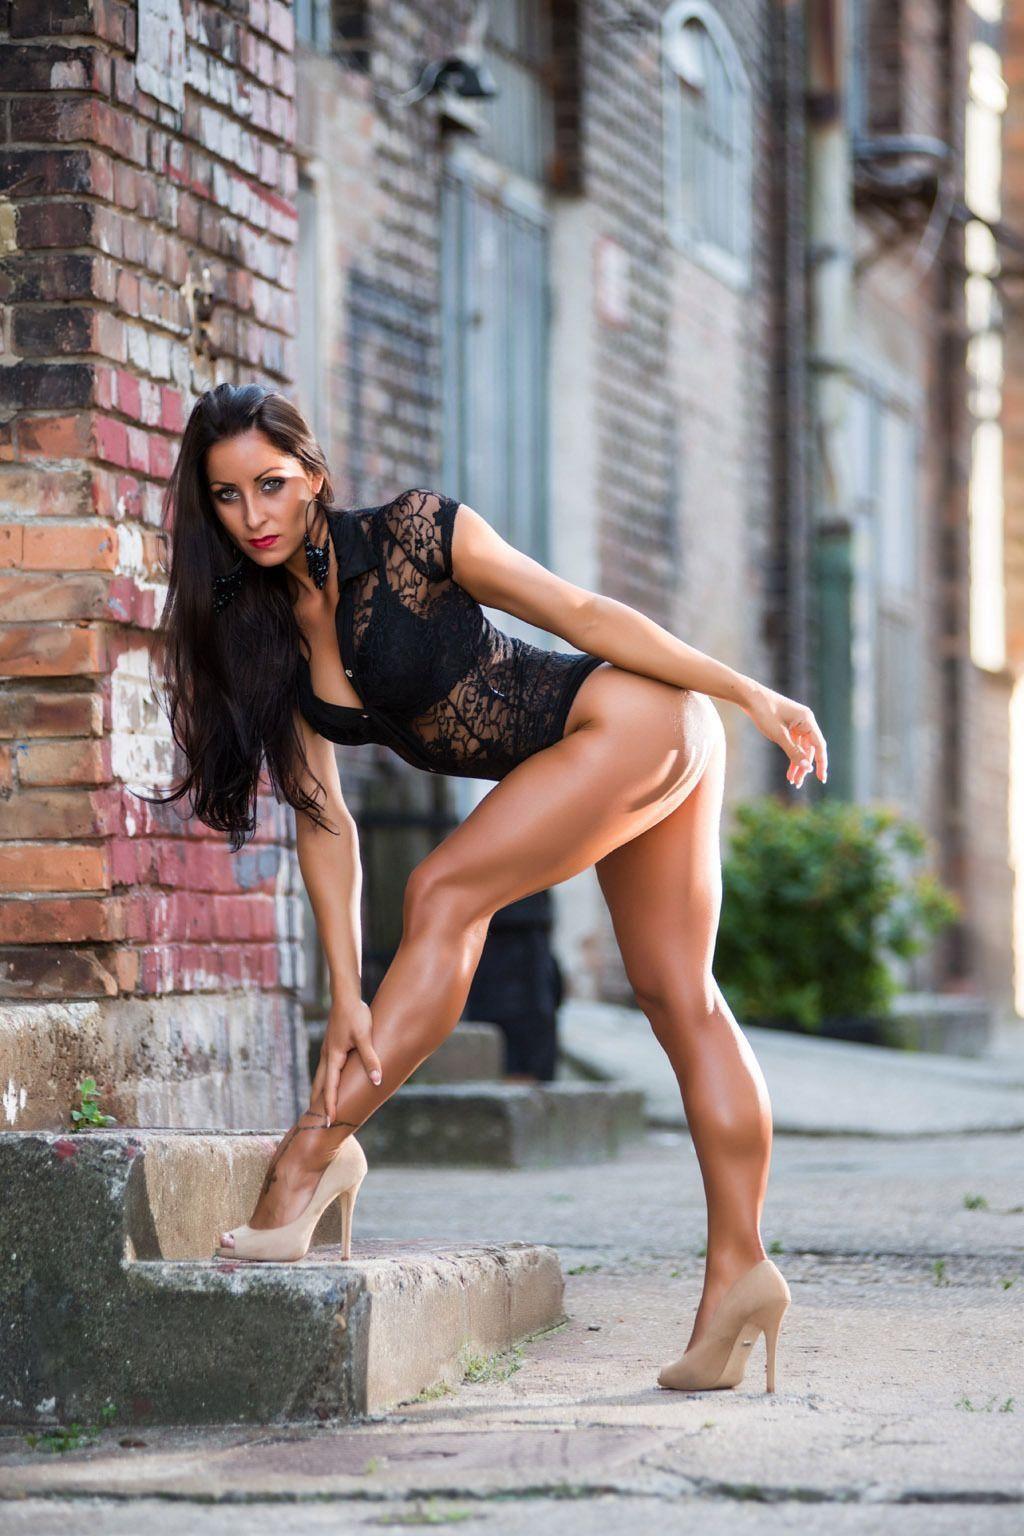 Sensuality sensual sexy woman girl model wet water sweaty drops rain dress red legs feet barefoot lying wallpaper